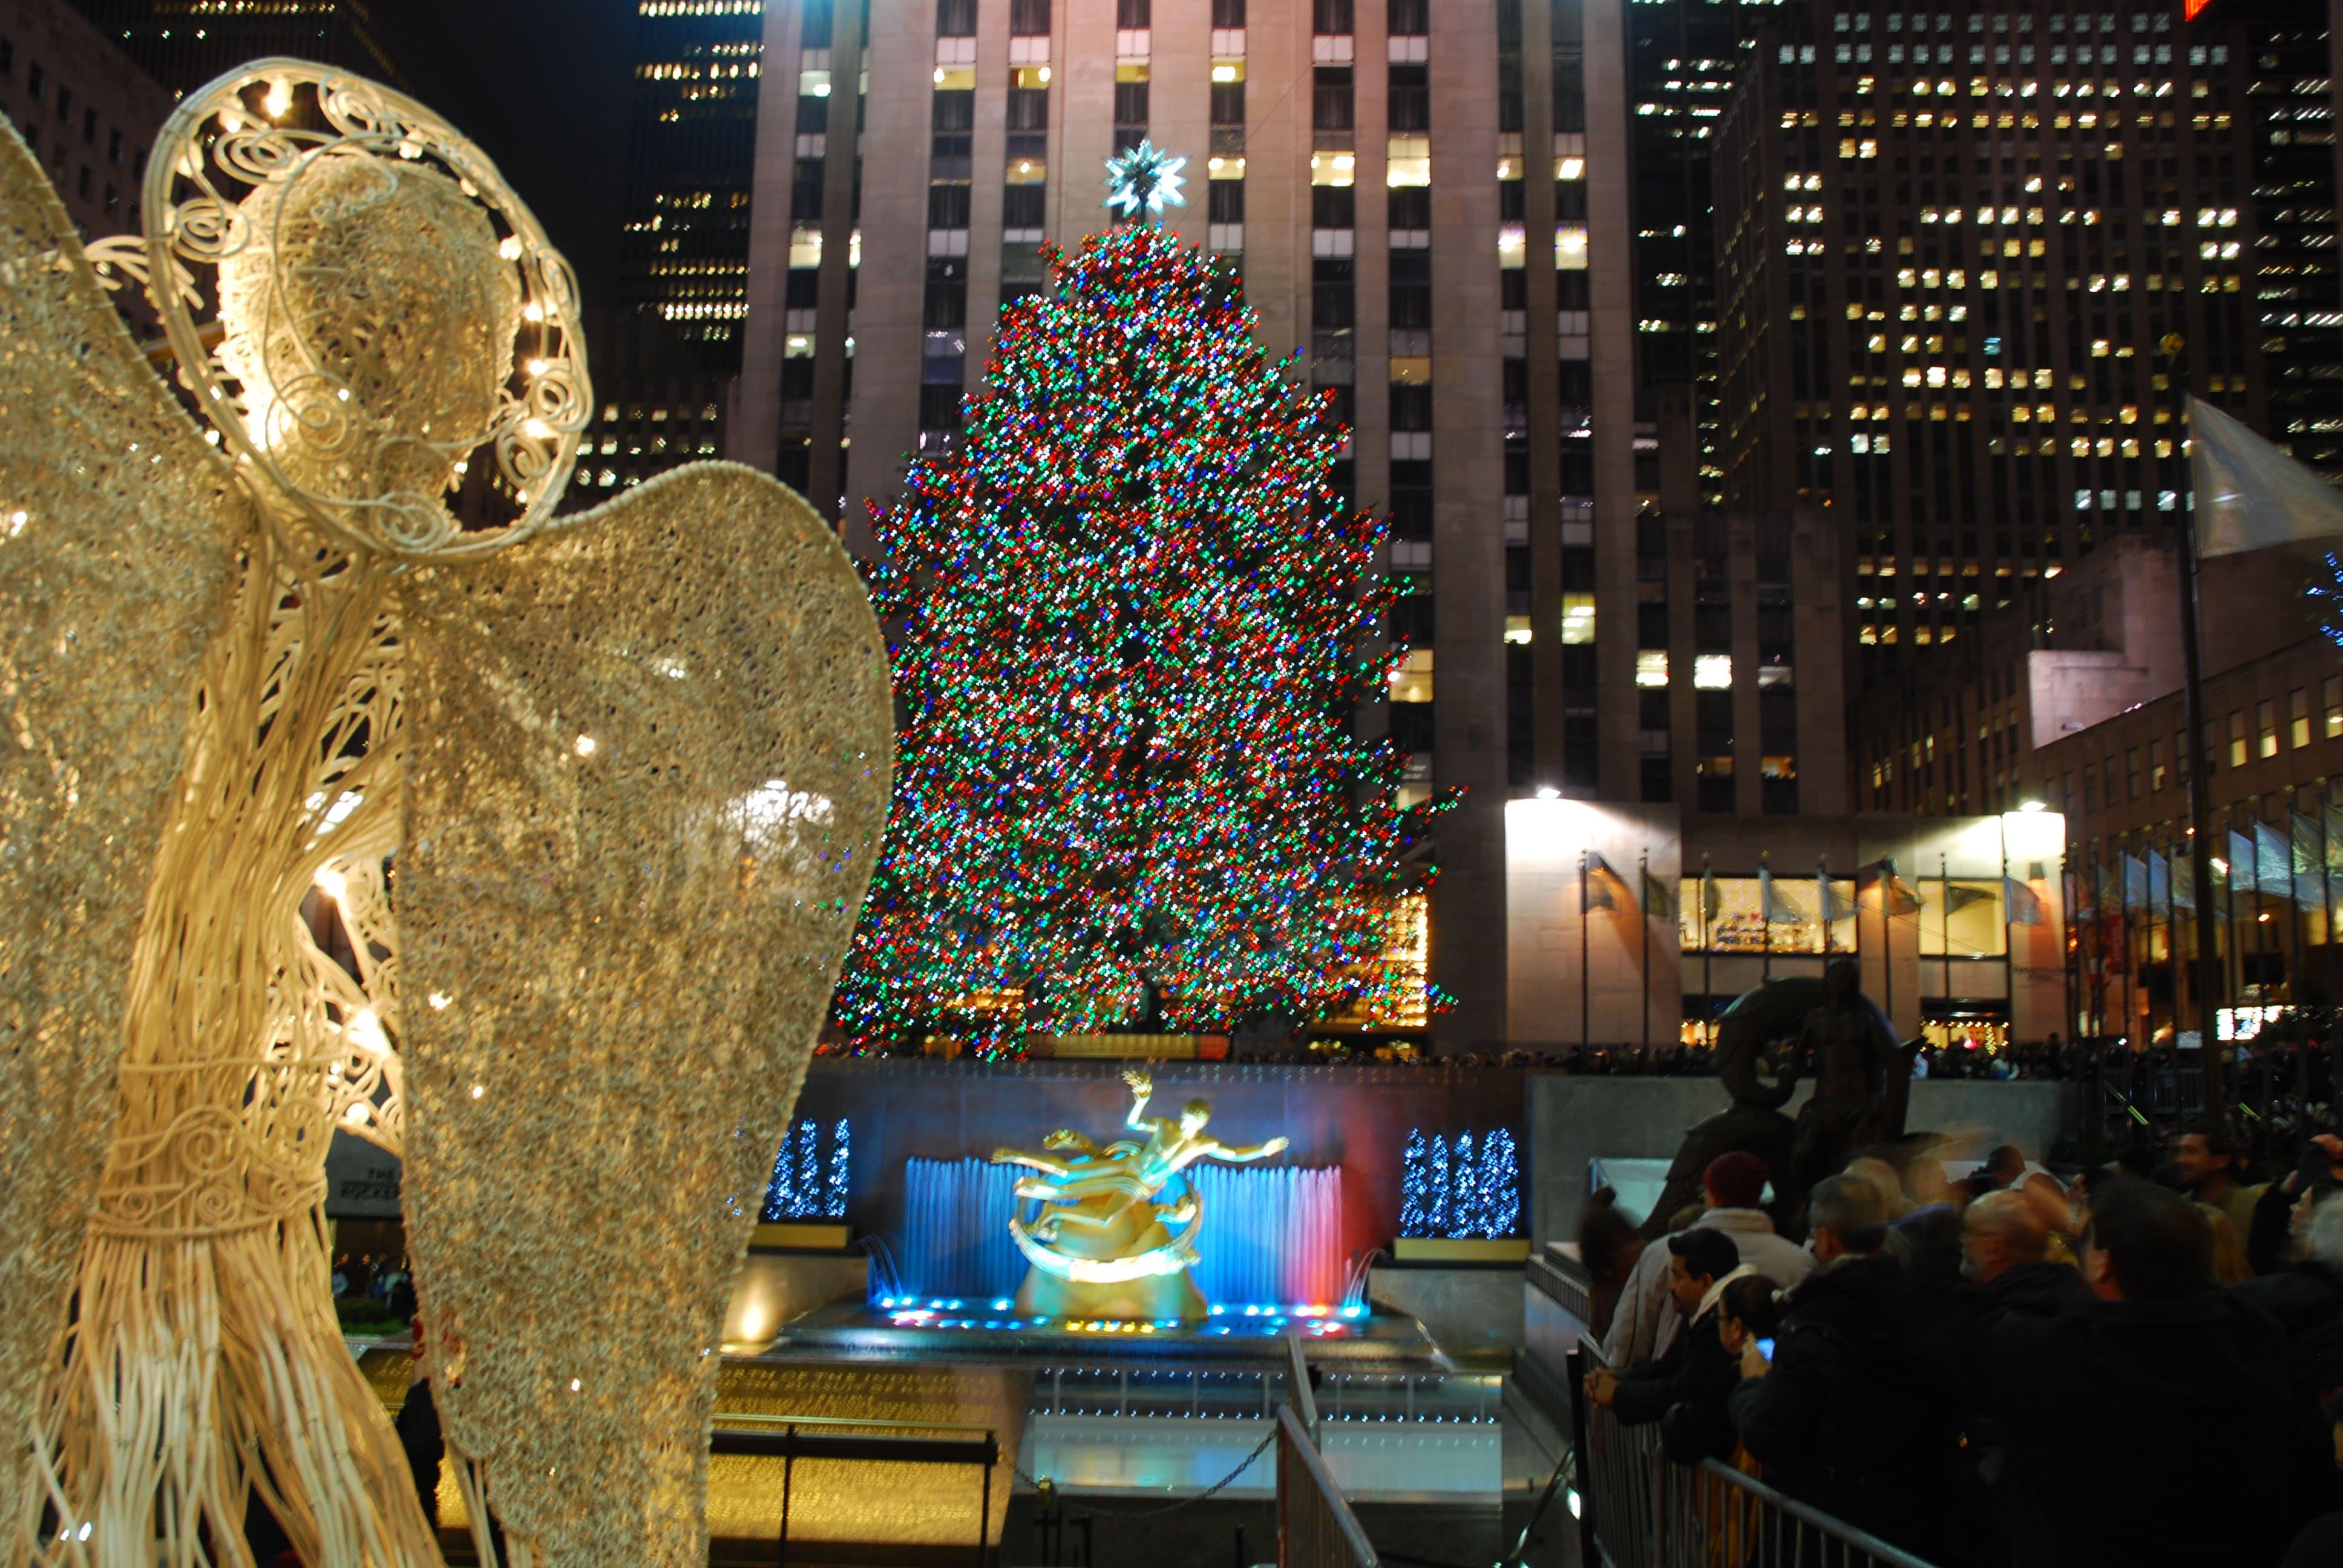 نیویورک در کریسمس